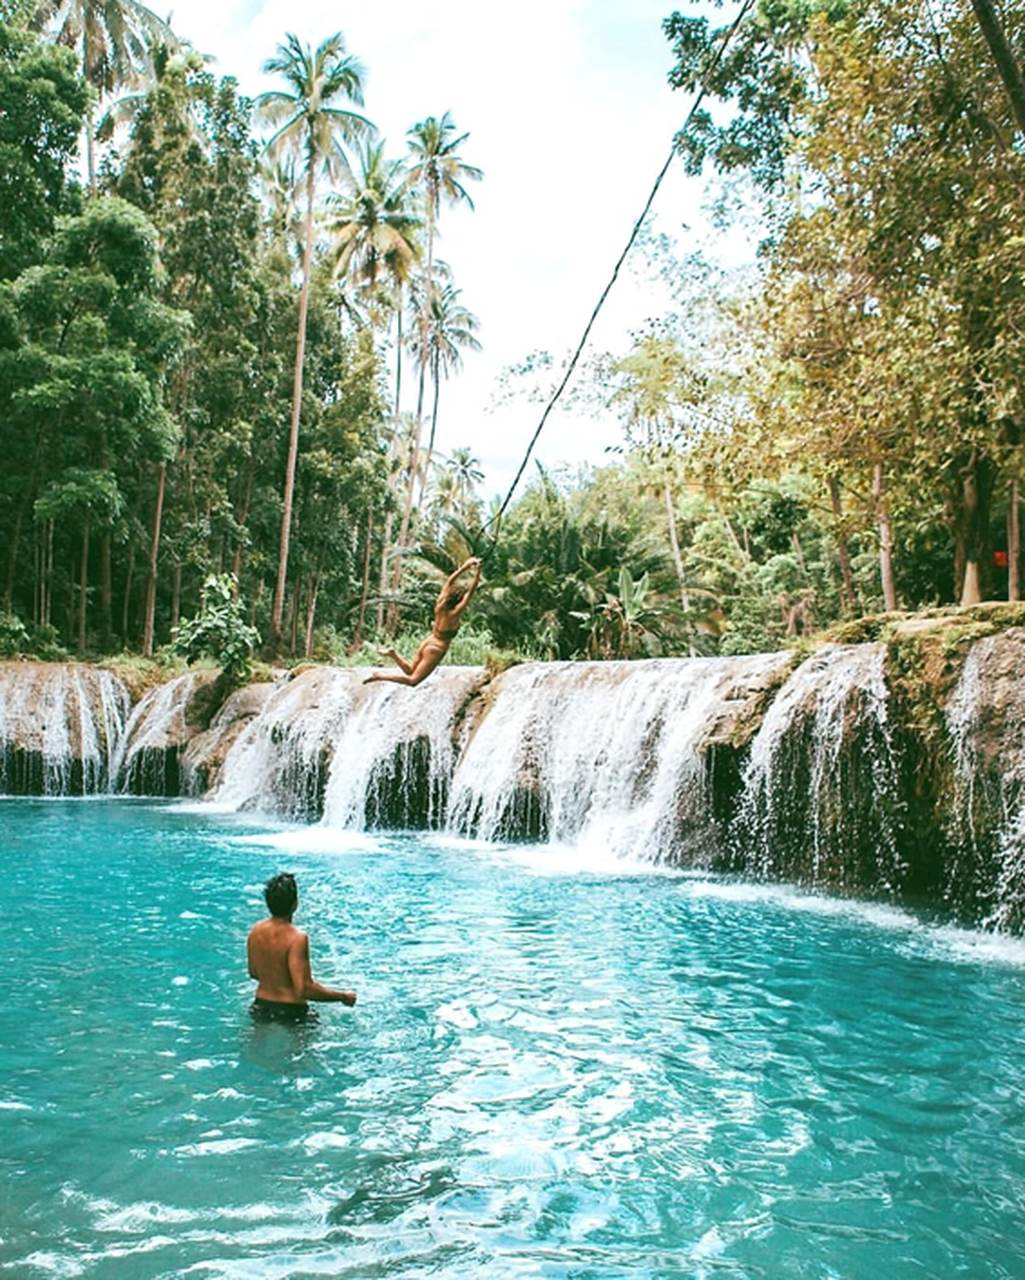 Conheça o parque Cambugahay Falls